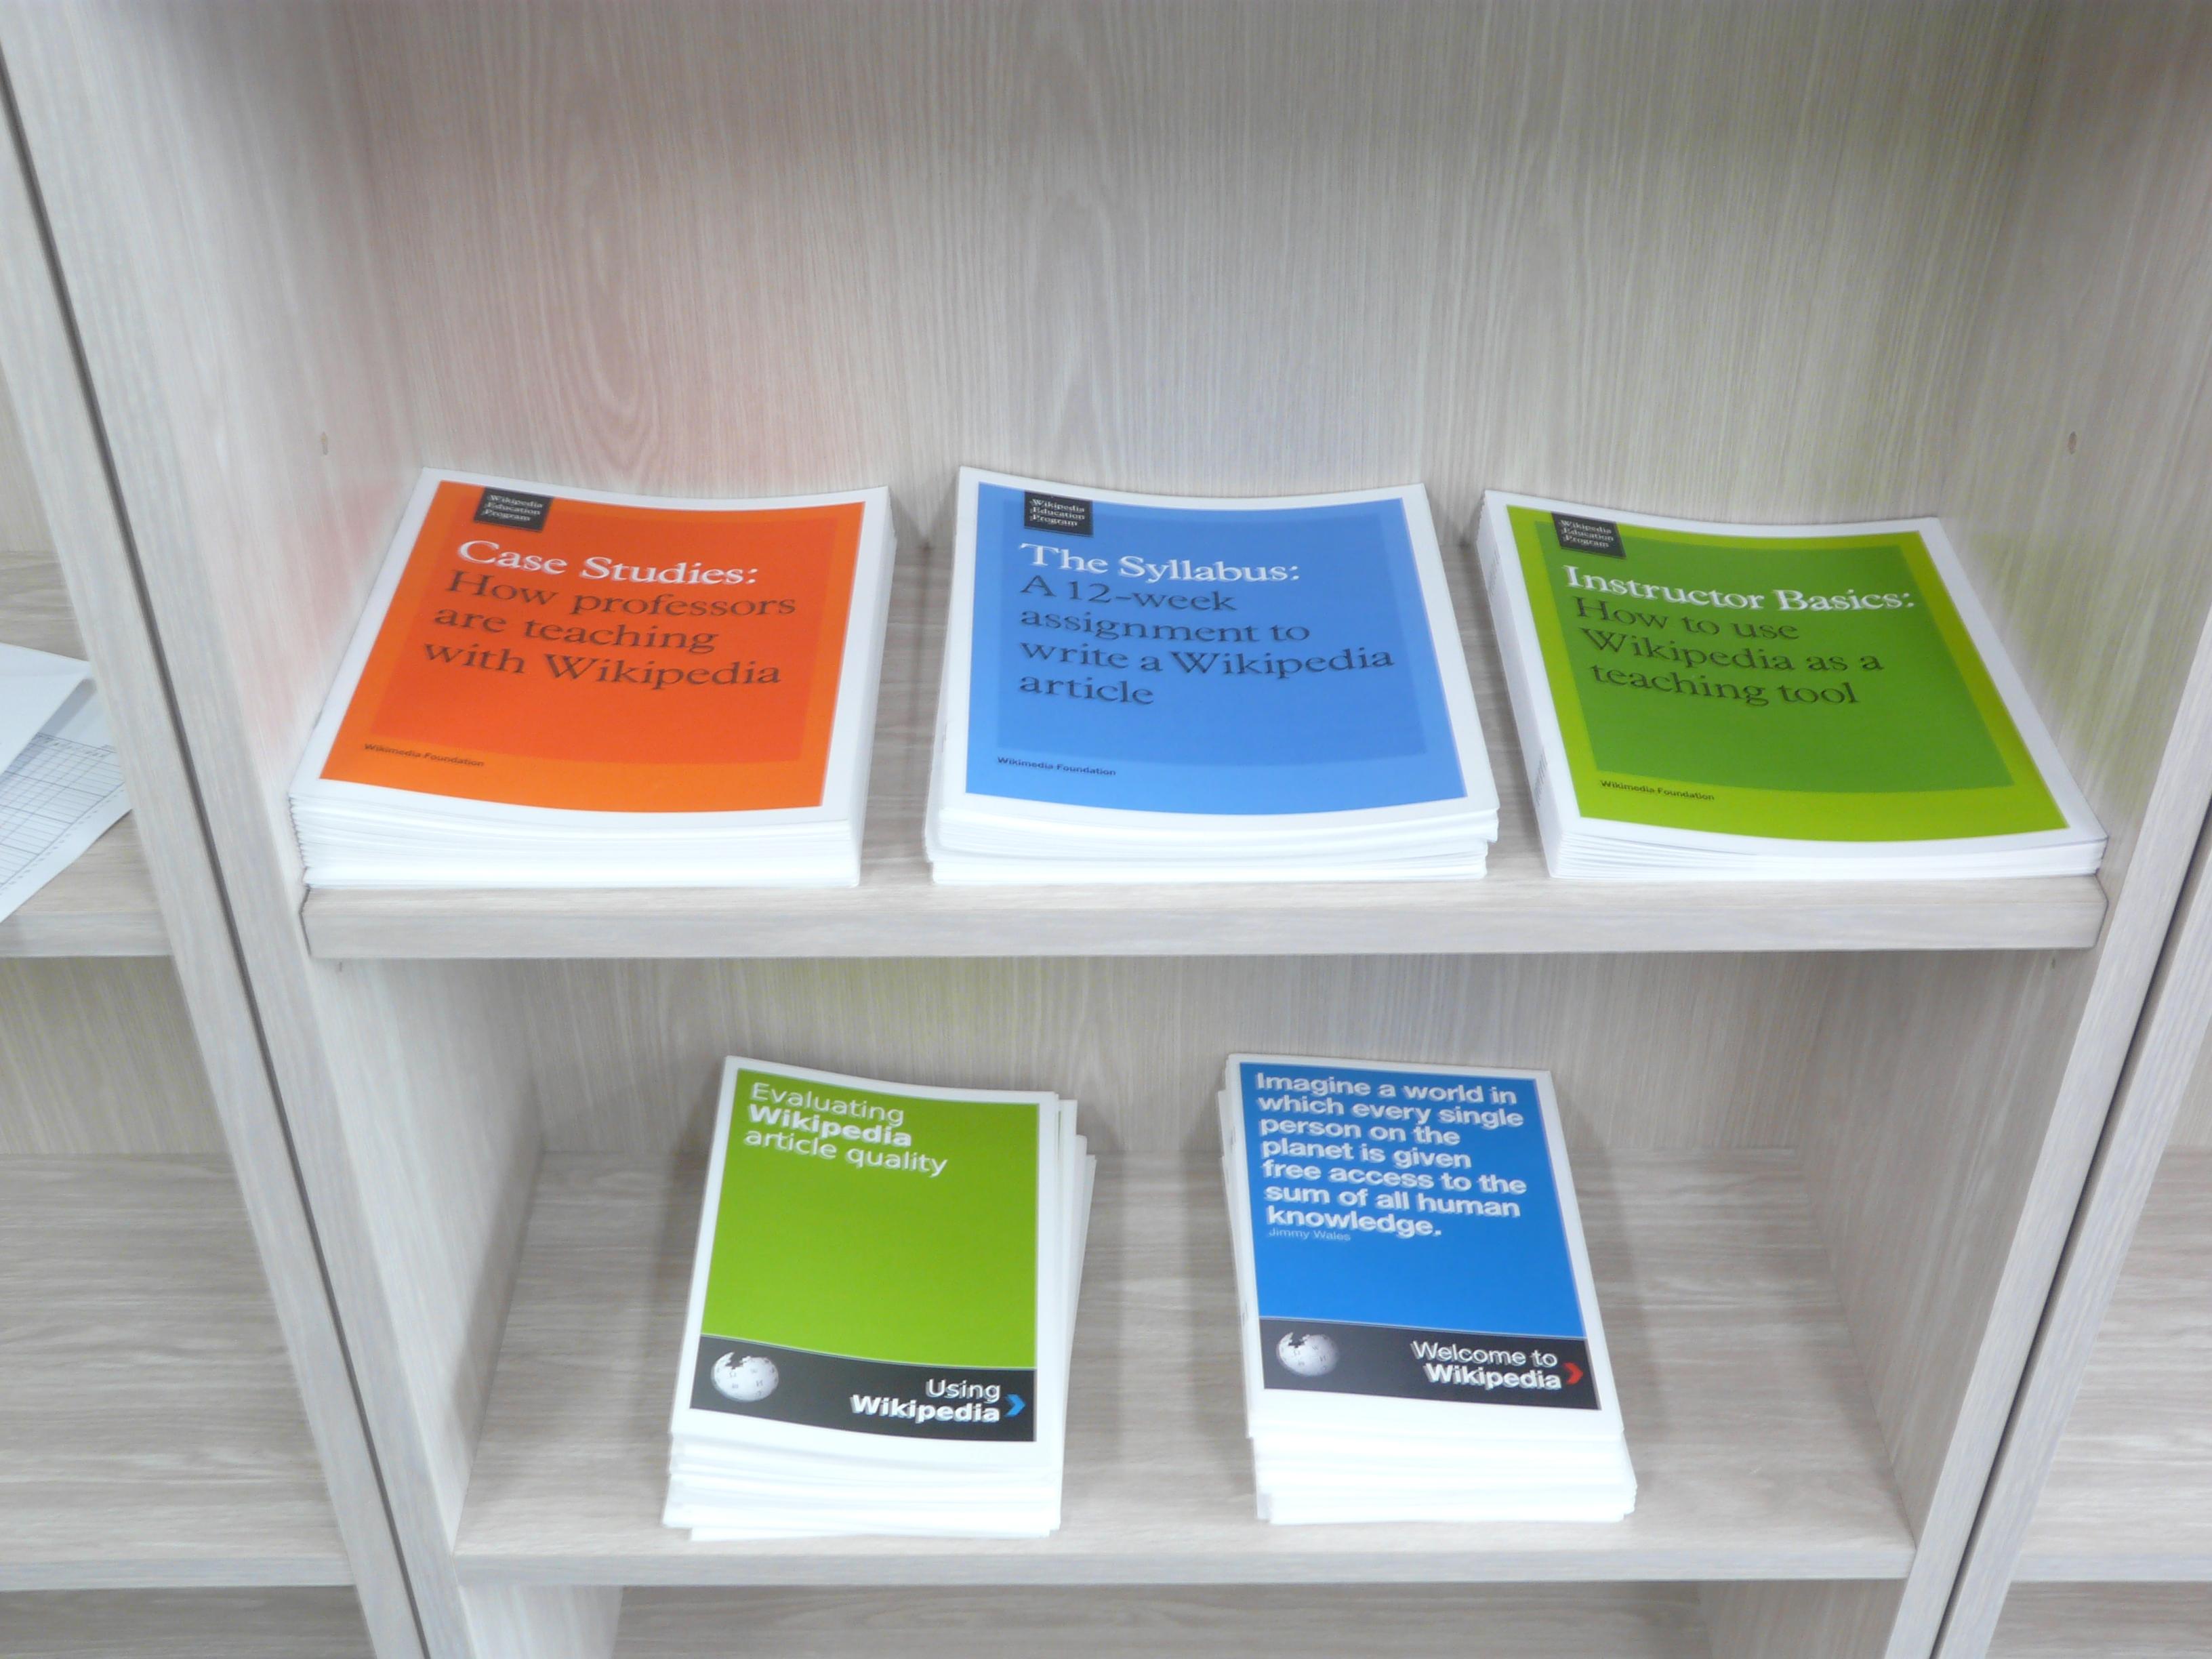 File:Wikimedia foundation wikipedia educational brochures.JPG ...